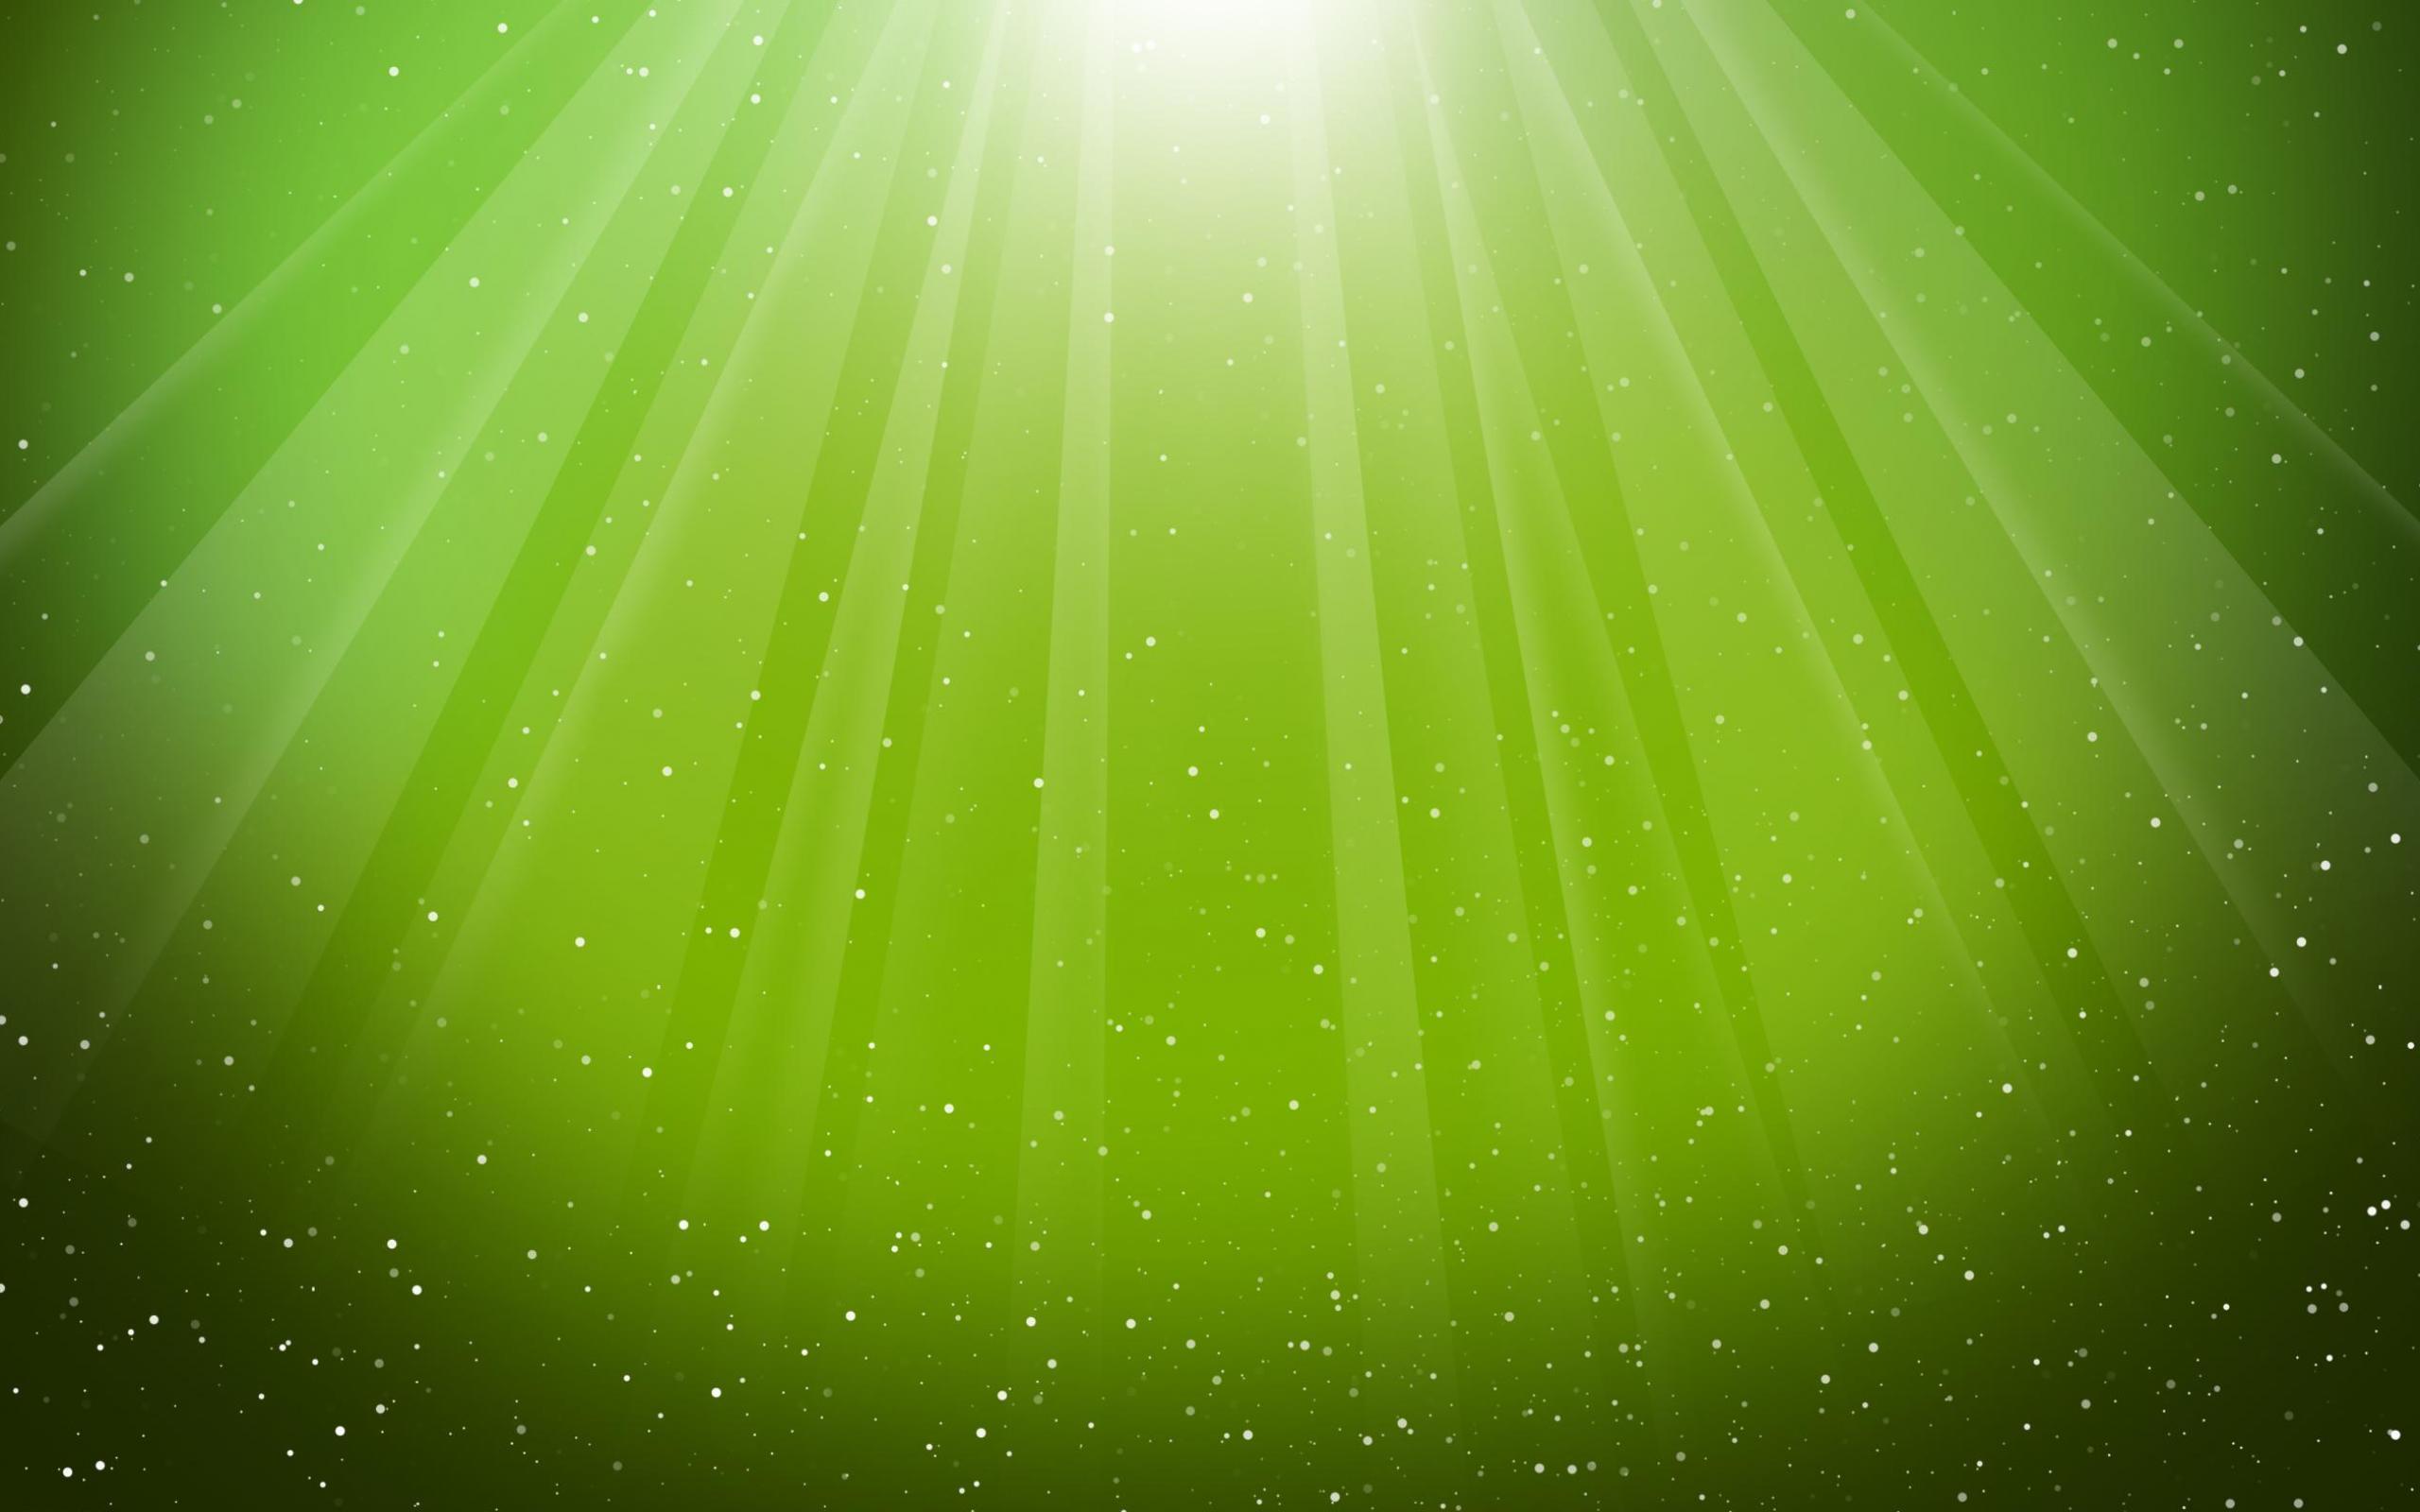 Обои Зеленый свет - абстрактные на ...: hq-oboi.ru/wall/zelenyy_svet_abstraktnye_na_rabochiy_stol_2560x1600